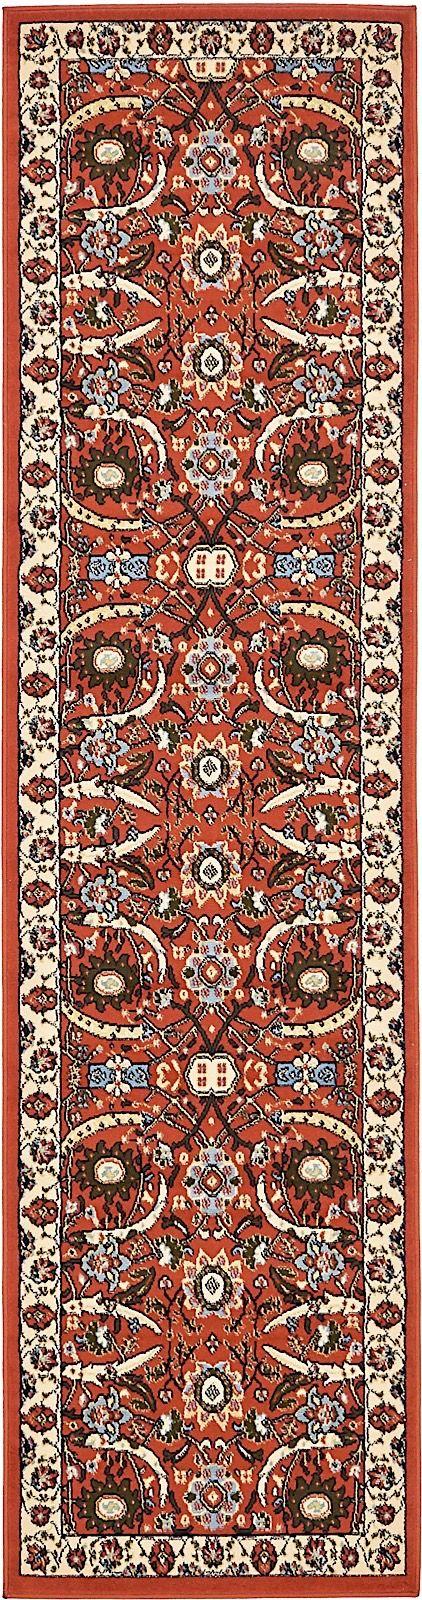 unique loom espahan country & floral area rug collection